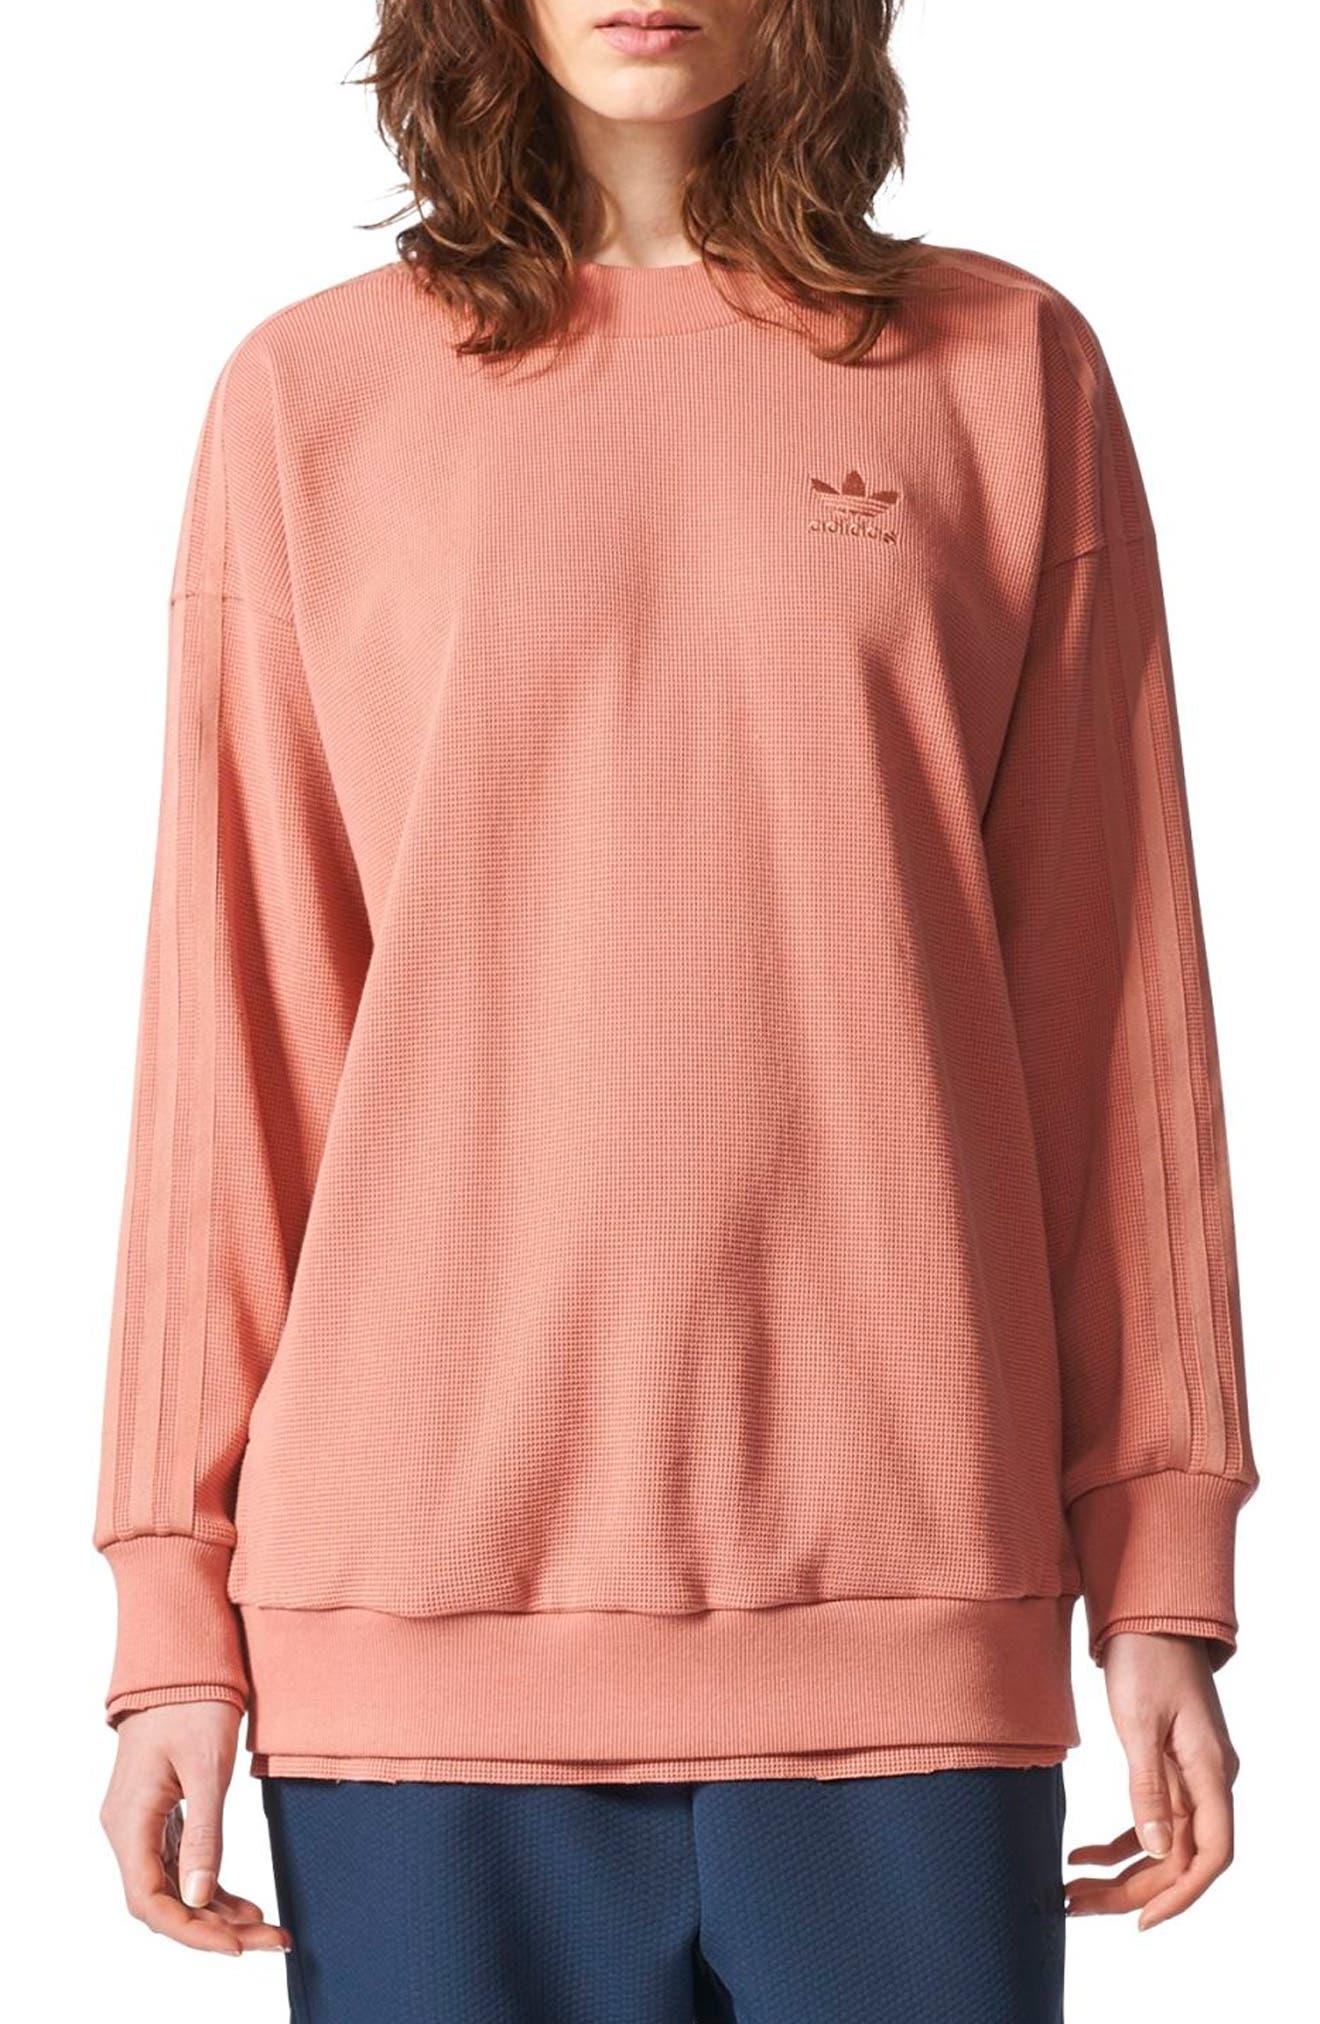 adidas Originals Thermal Sweatshirt